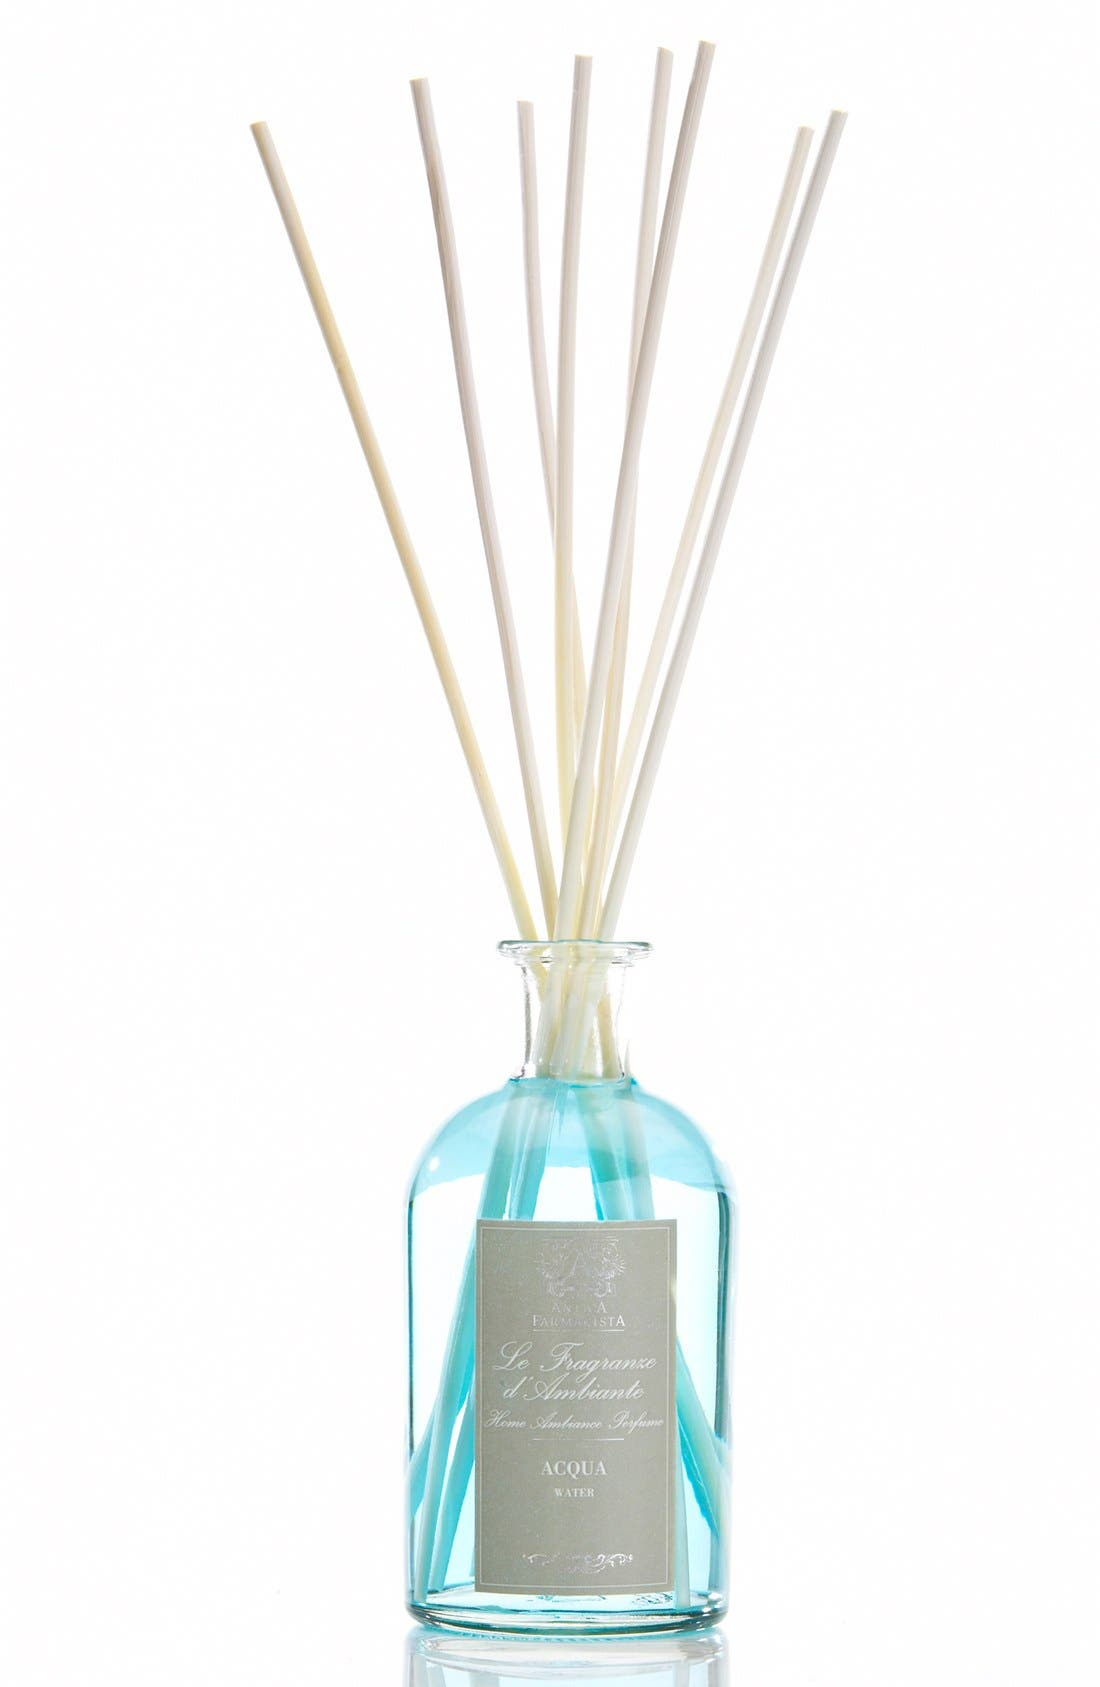 Acqua Home Ambiance Perfume,                             Main thumbnail 1, color,                             NO COLOR